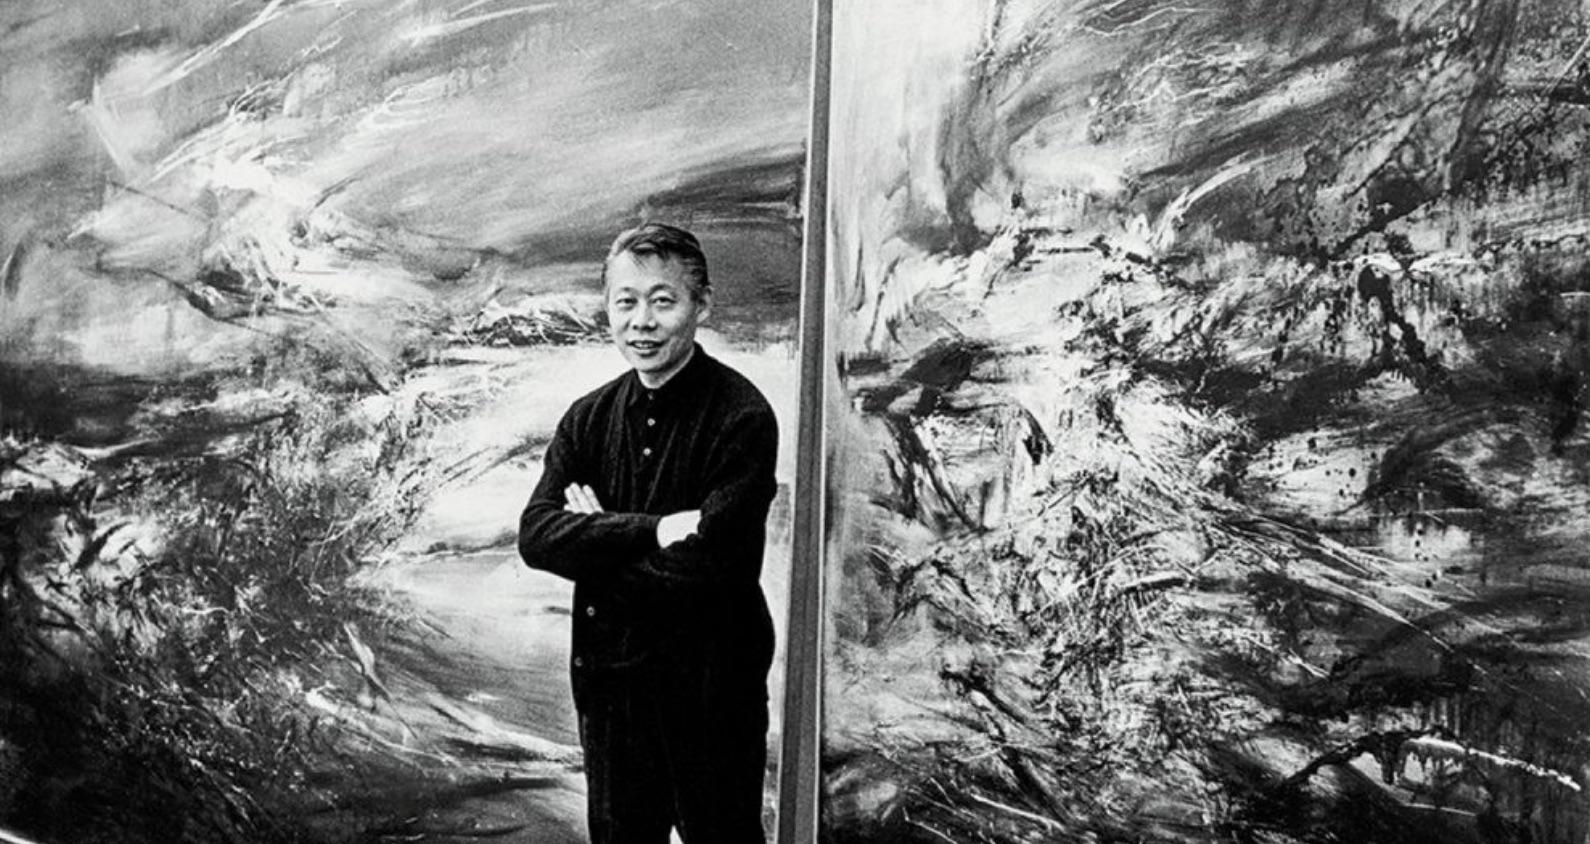 David Stekert/Budd Studio/Zao Wou-Ki/ADAGP, Paris 2018